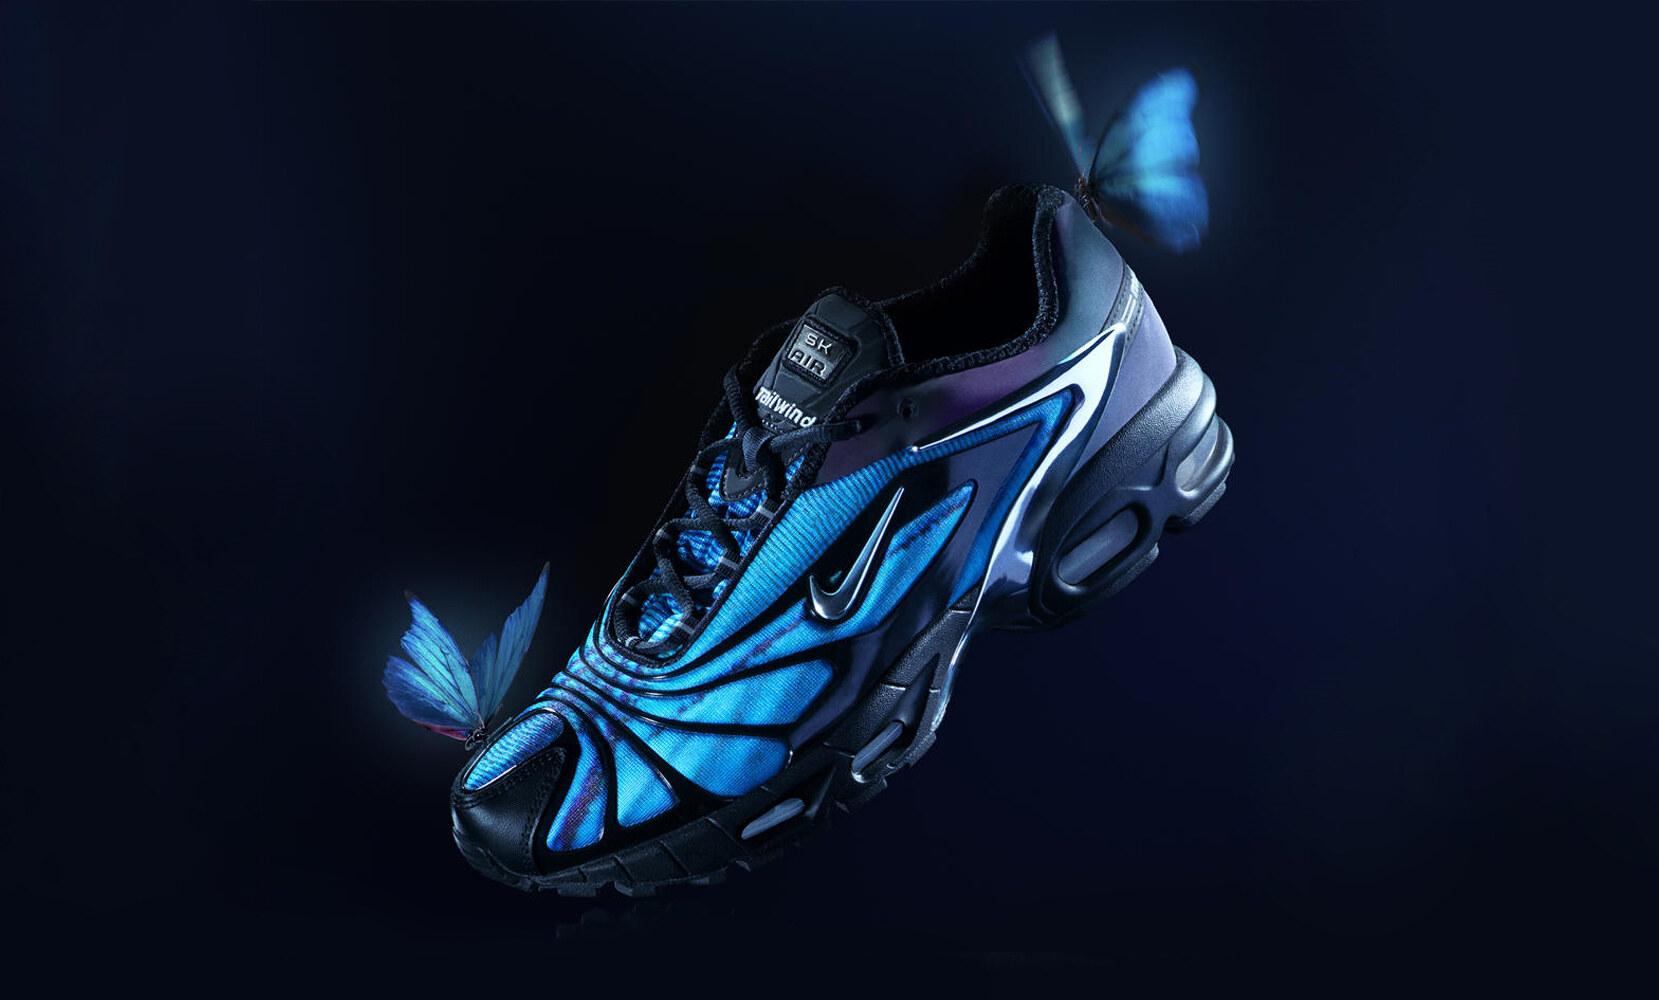 Skepta x Nike Air Tailwind V